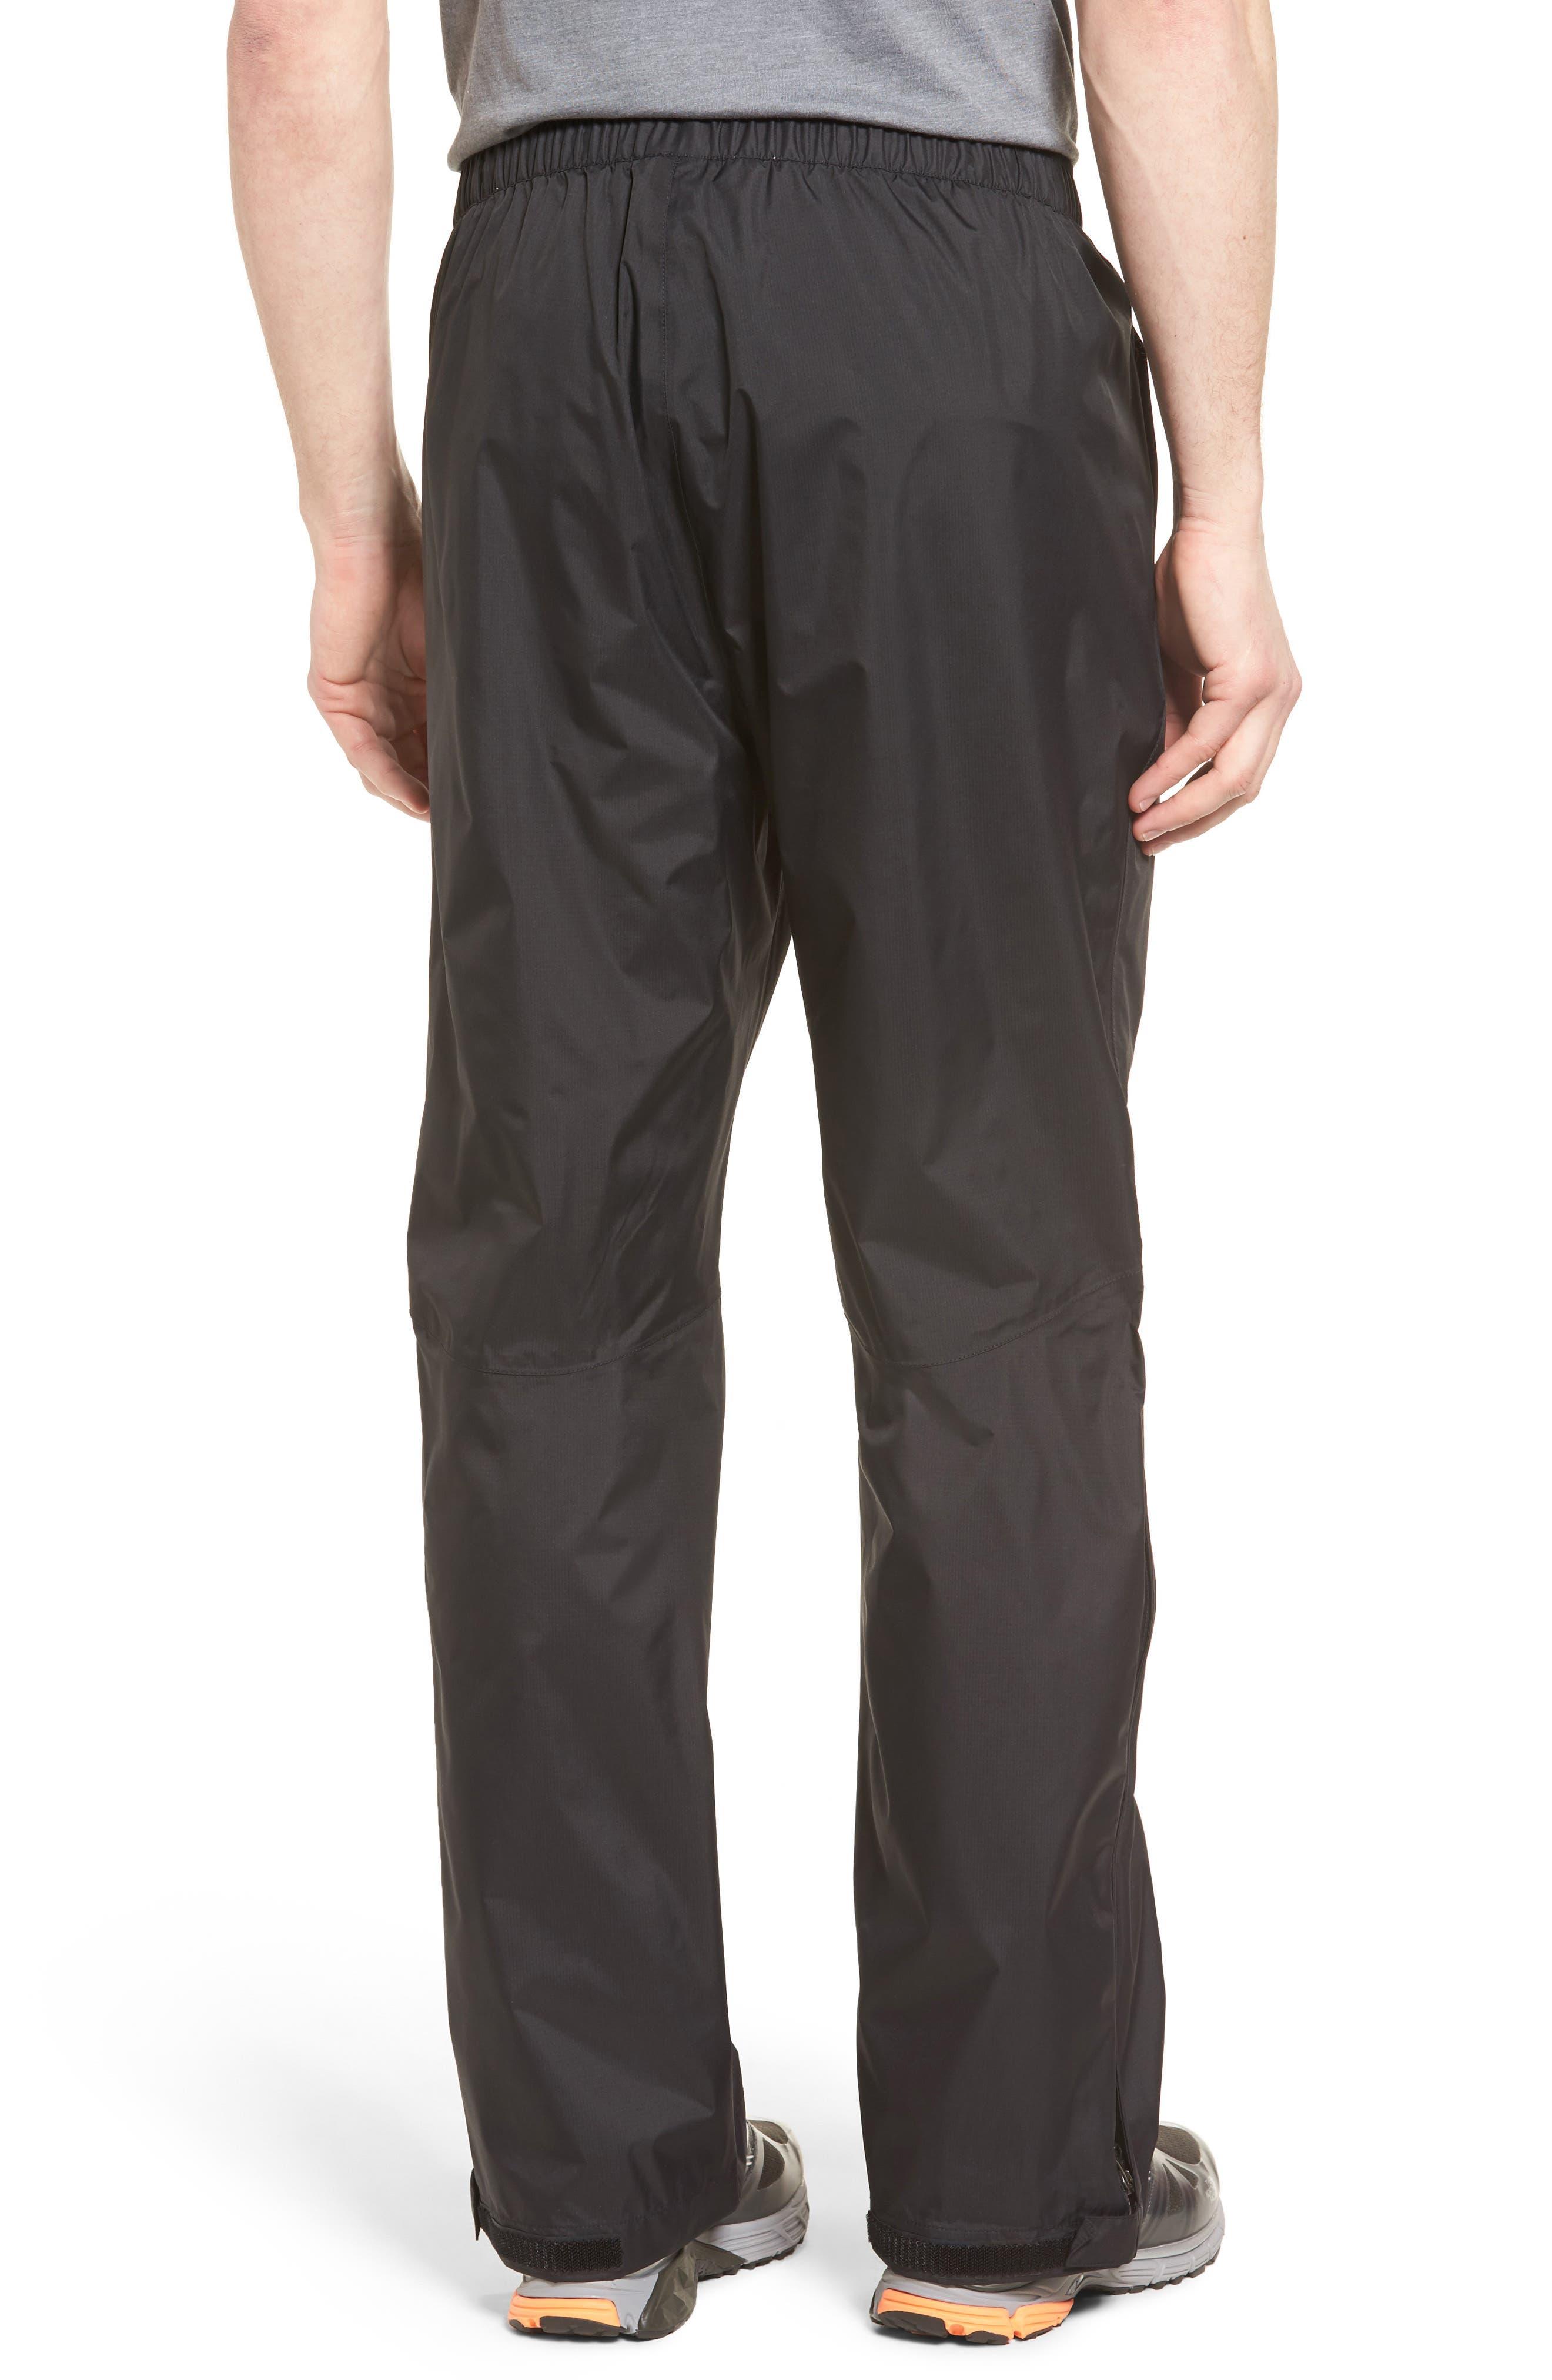 Venture Waterproof Pants,                             Alternate thumbnail 2, color,                             Black